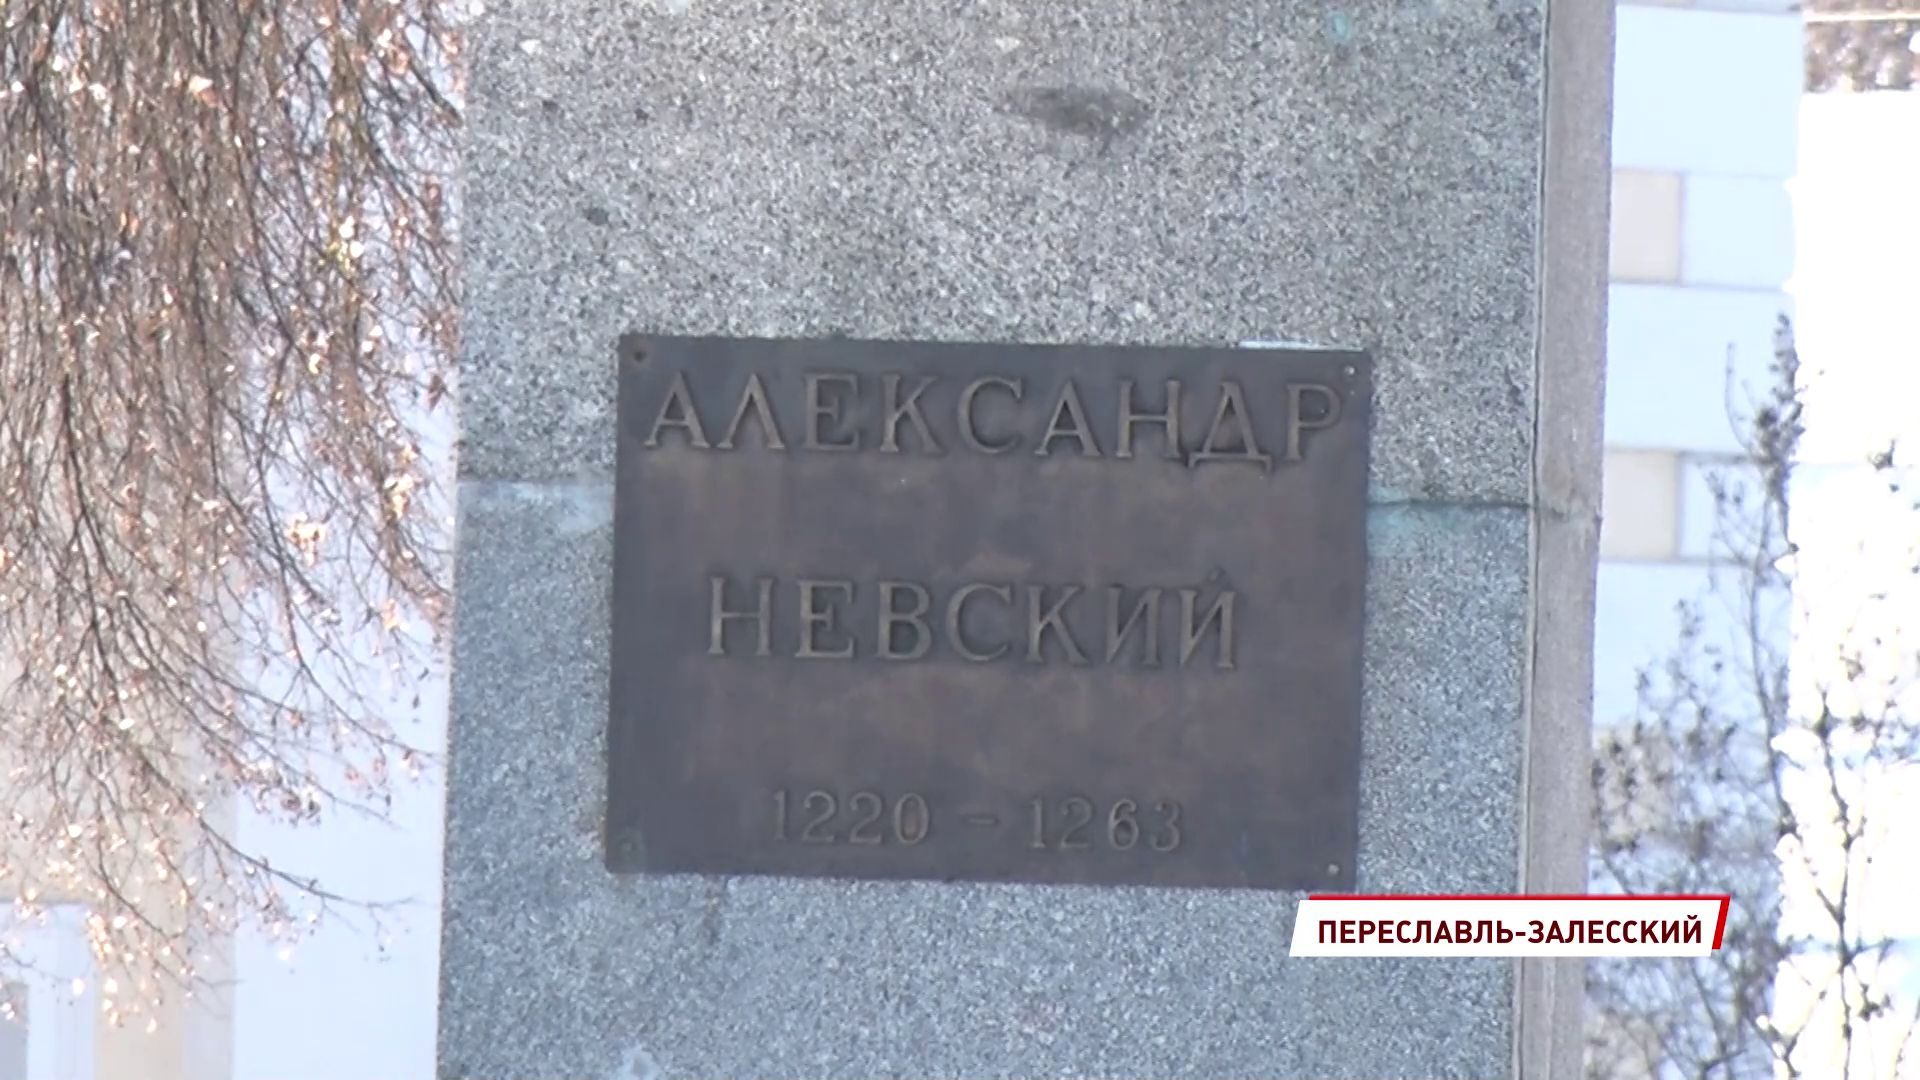 В Совете Федерации обсудили празднование 800-летия Александра Невского